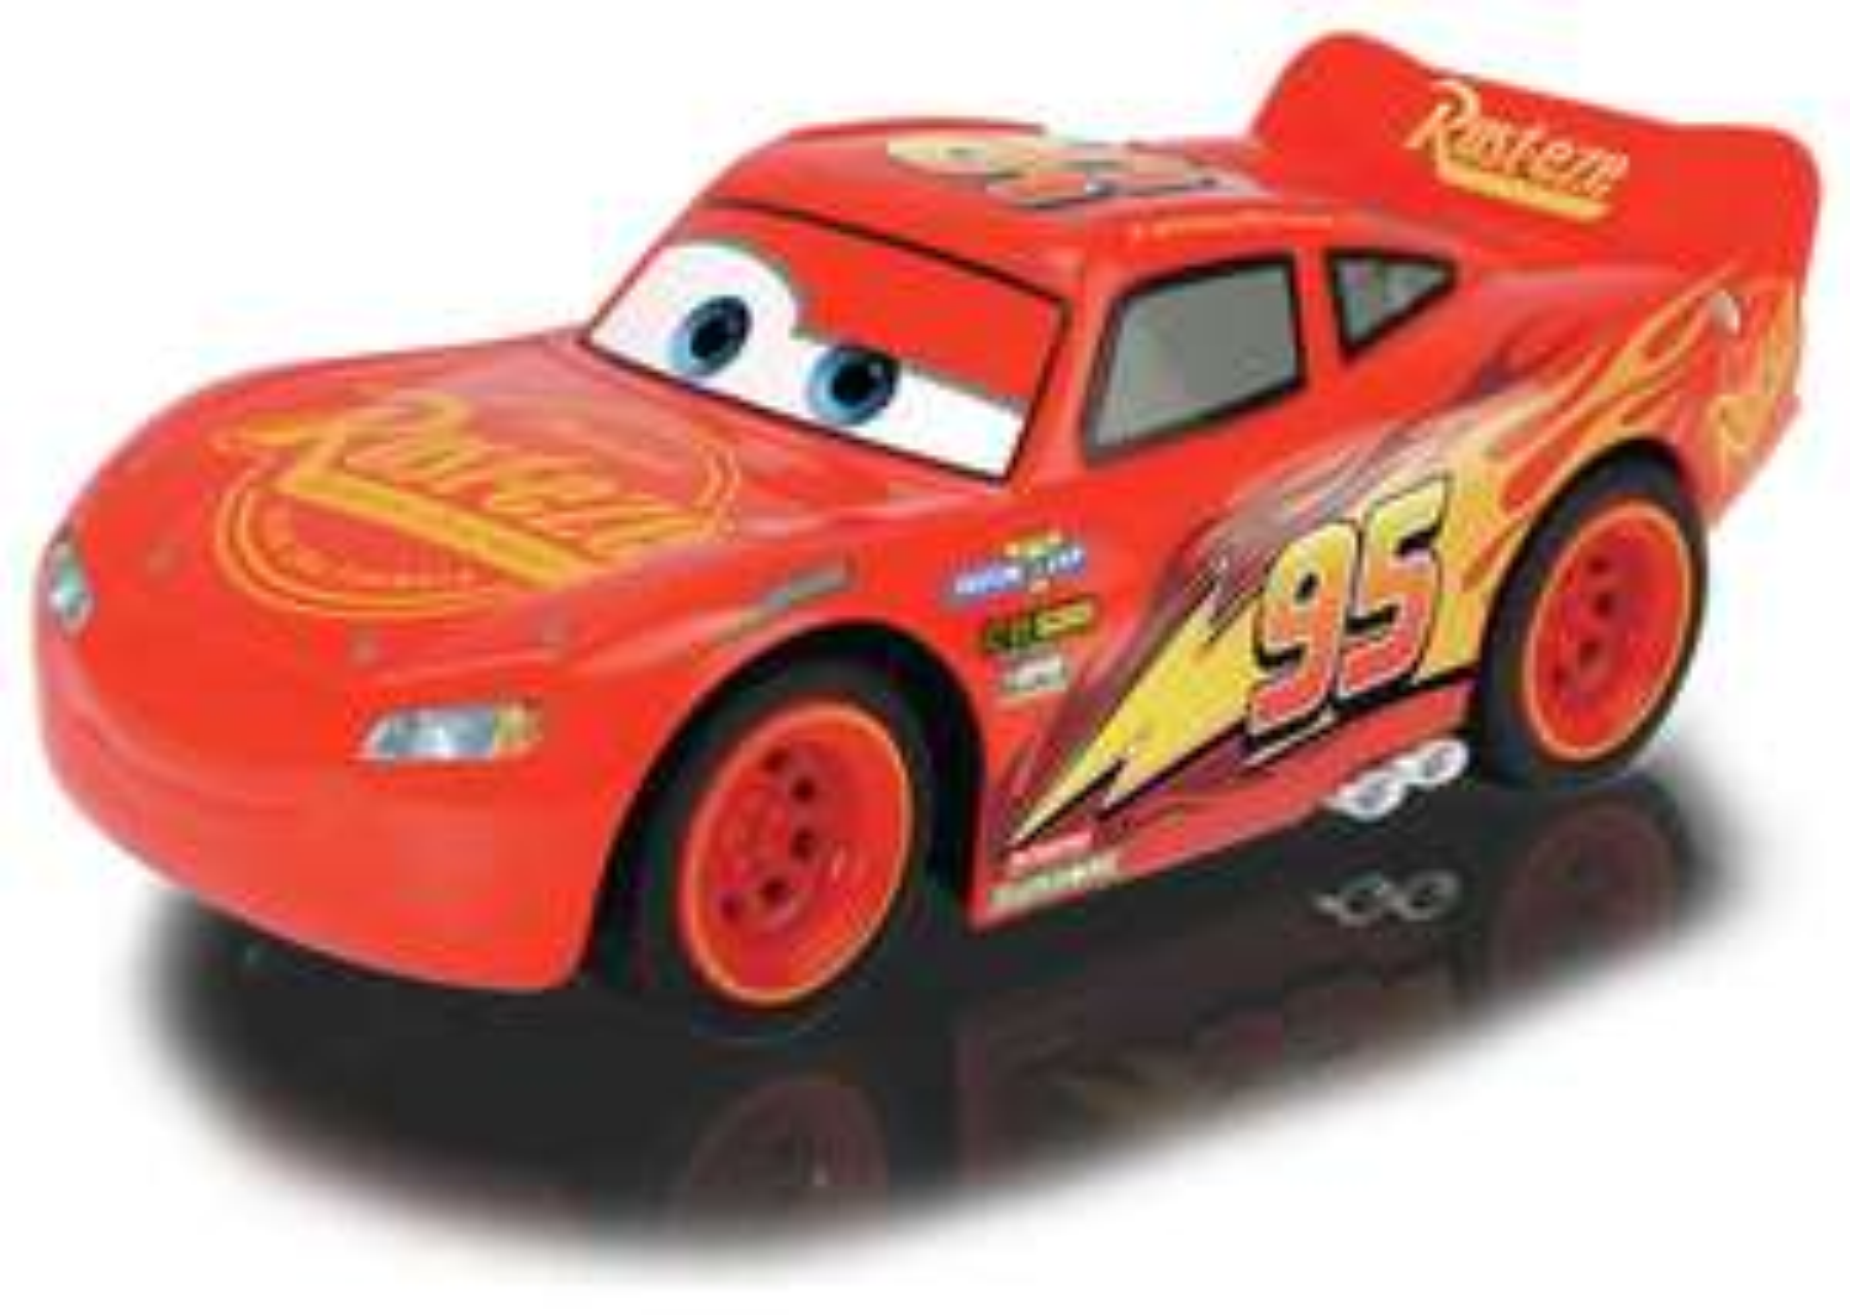 Cars 3 Giant Lightning McQueen RC Car 1:12 £20 @ Argos